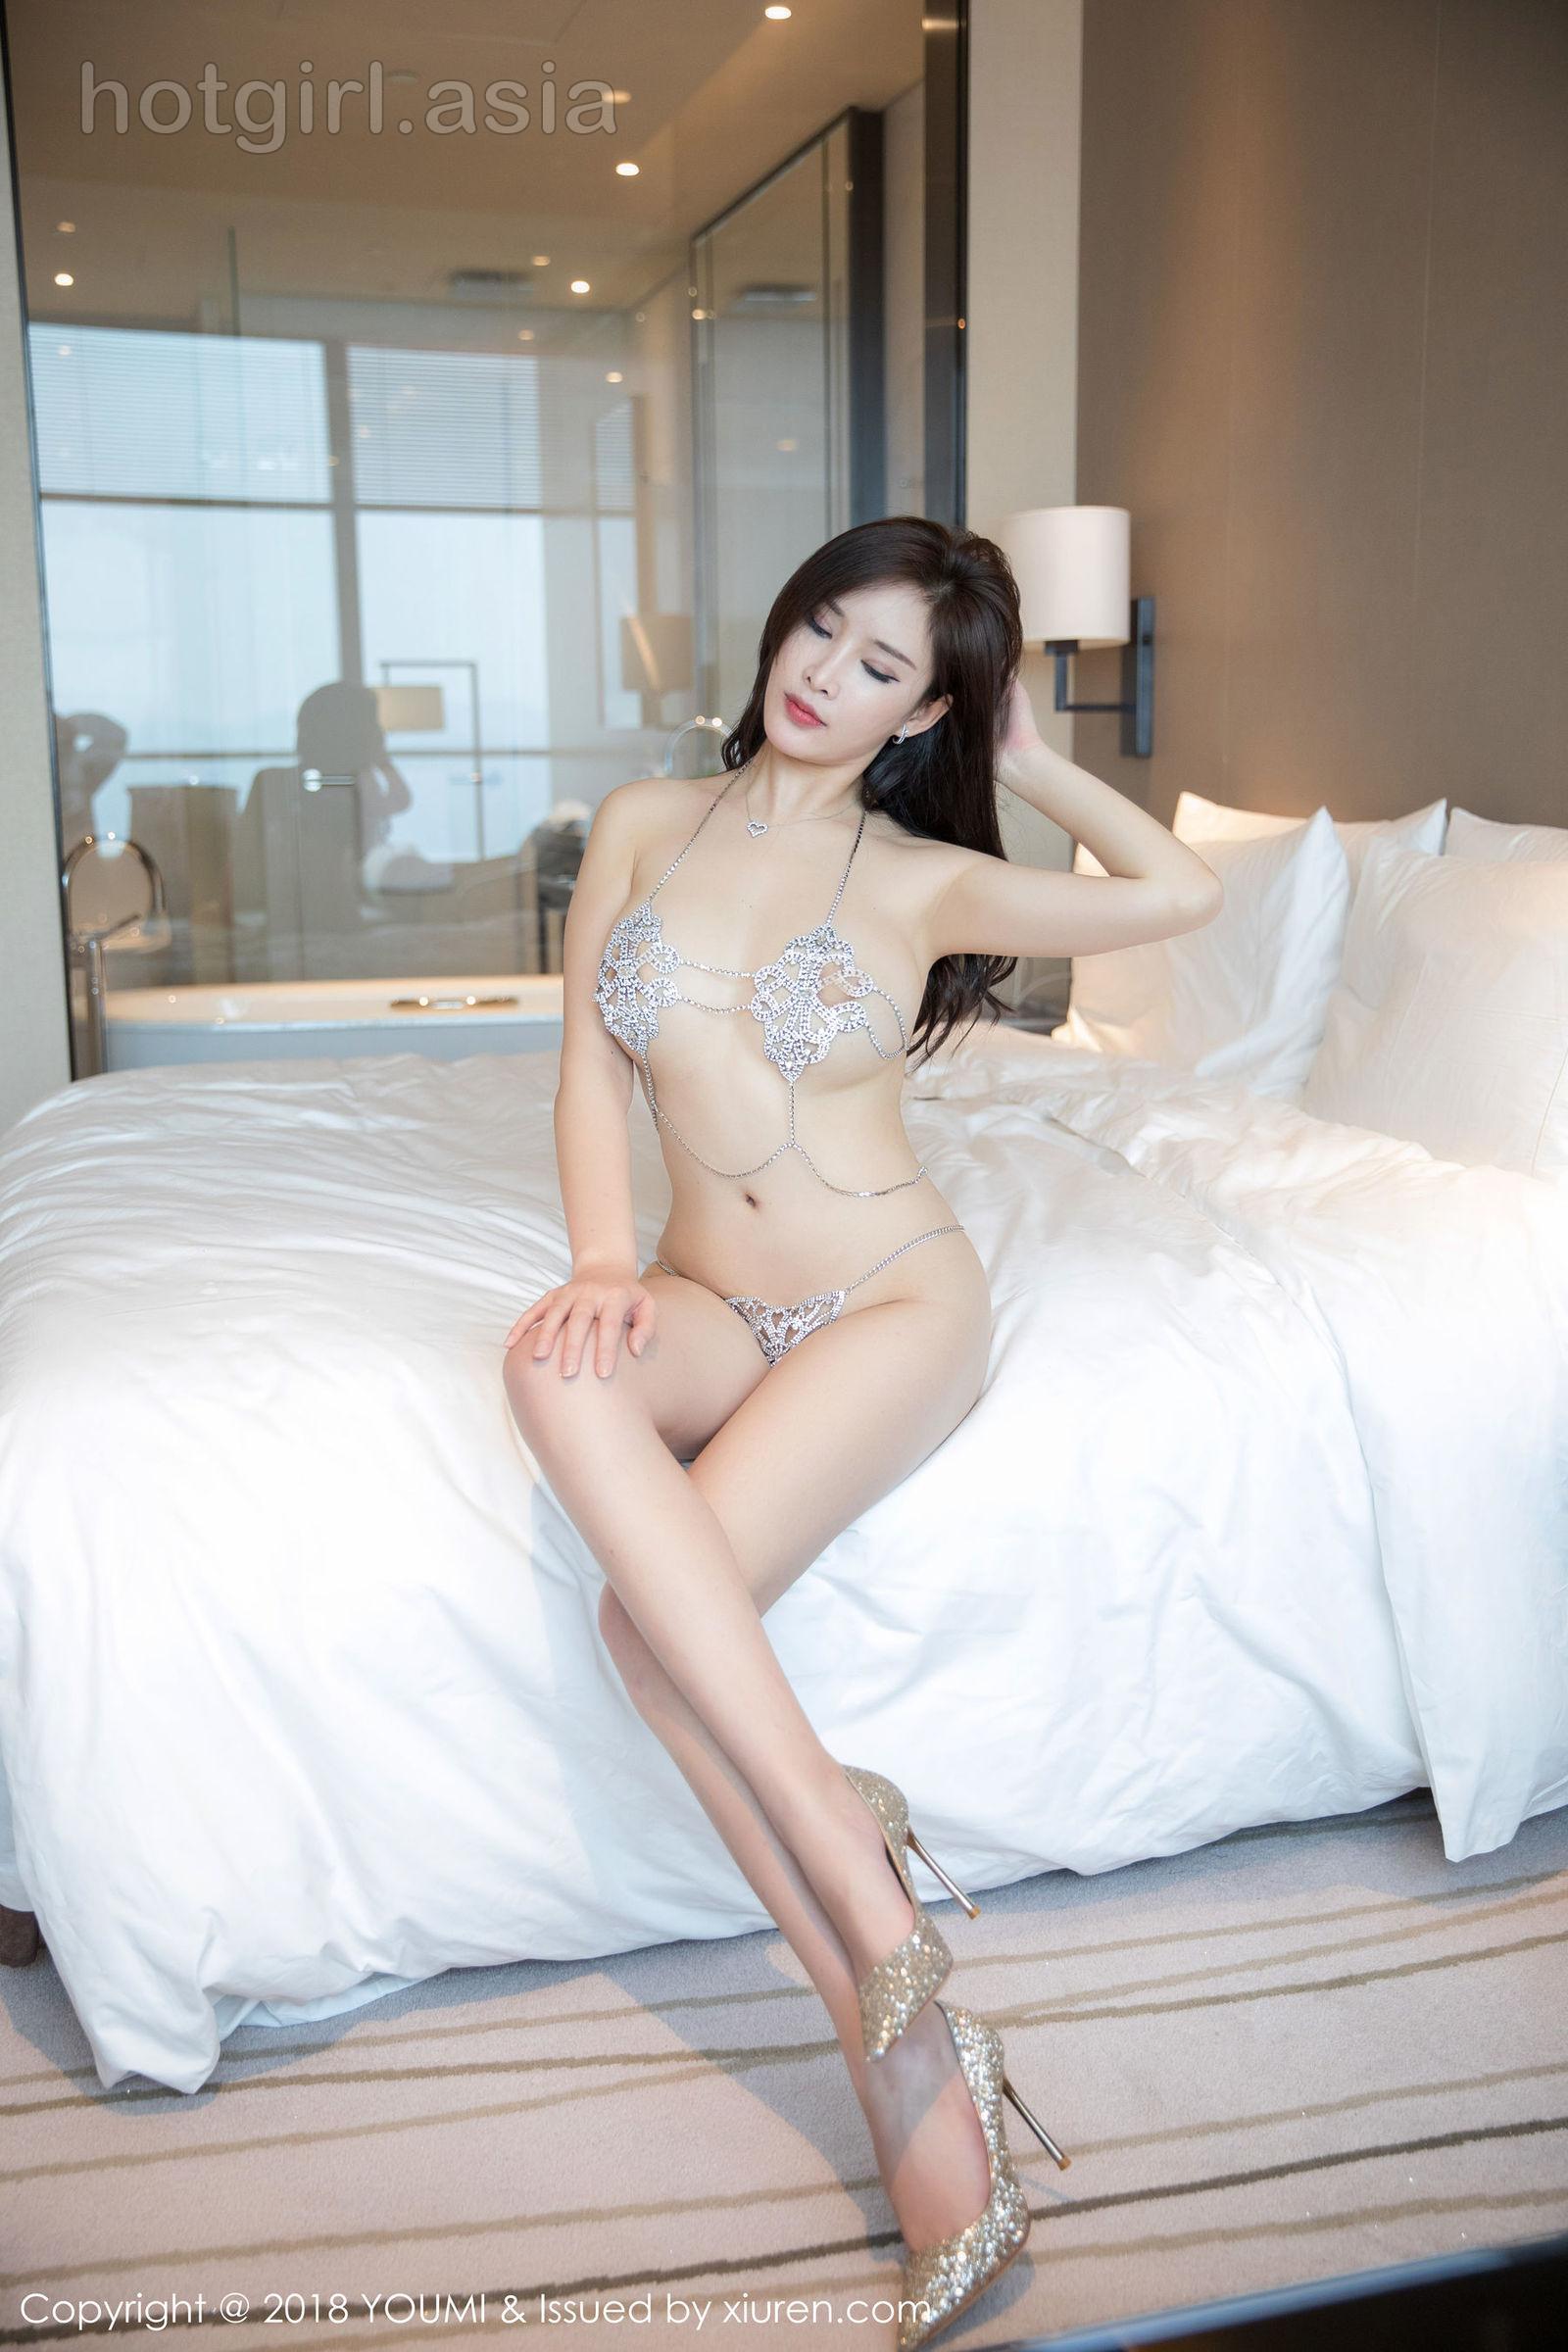 [YouMi 尤 蜜 荟] Vol.249 Sexy Goddess @ 奶瓶 土肥 圆圆 郁郁 黑黑 越-Private House Charm Photo